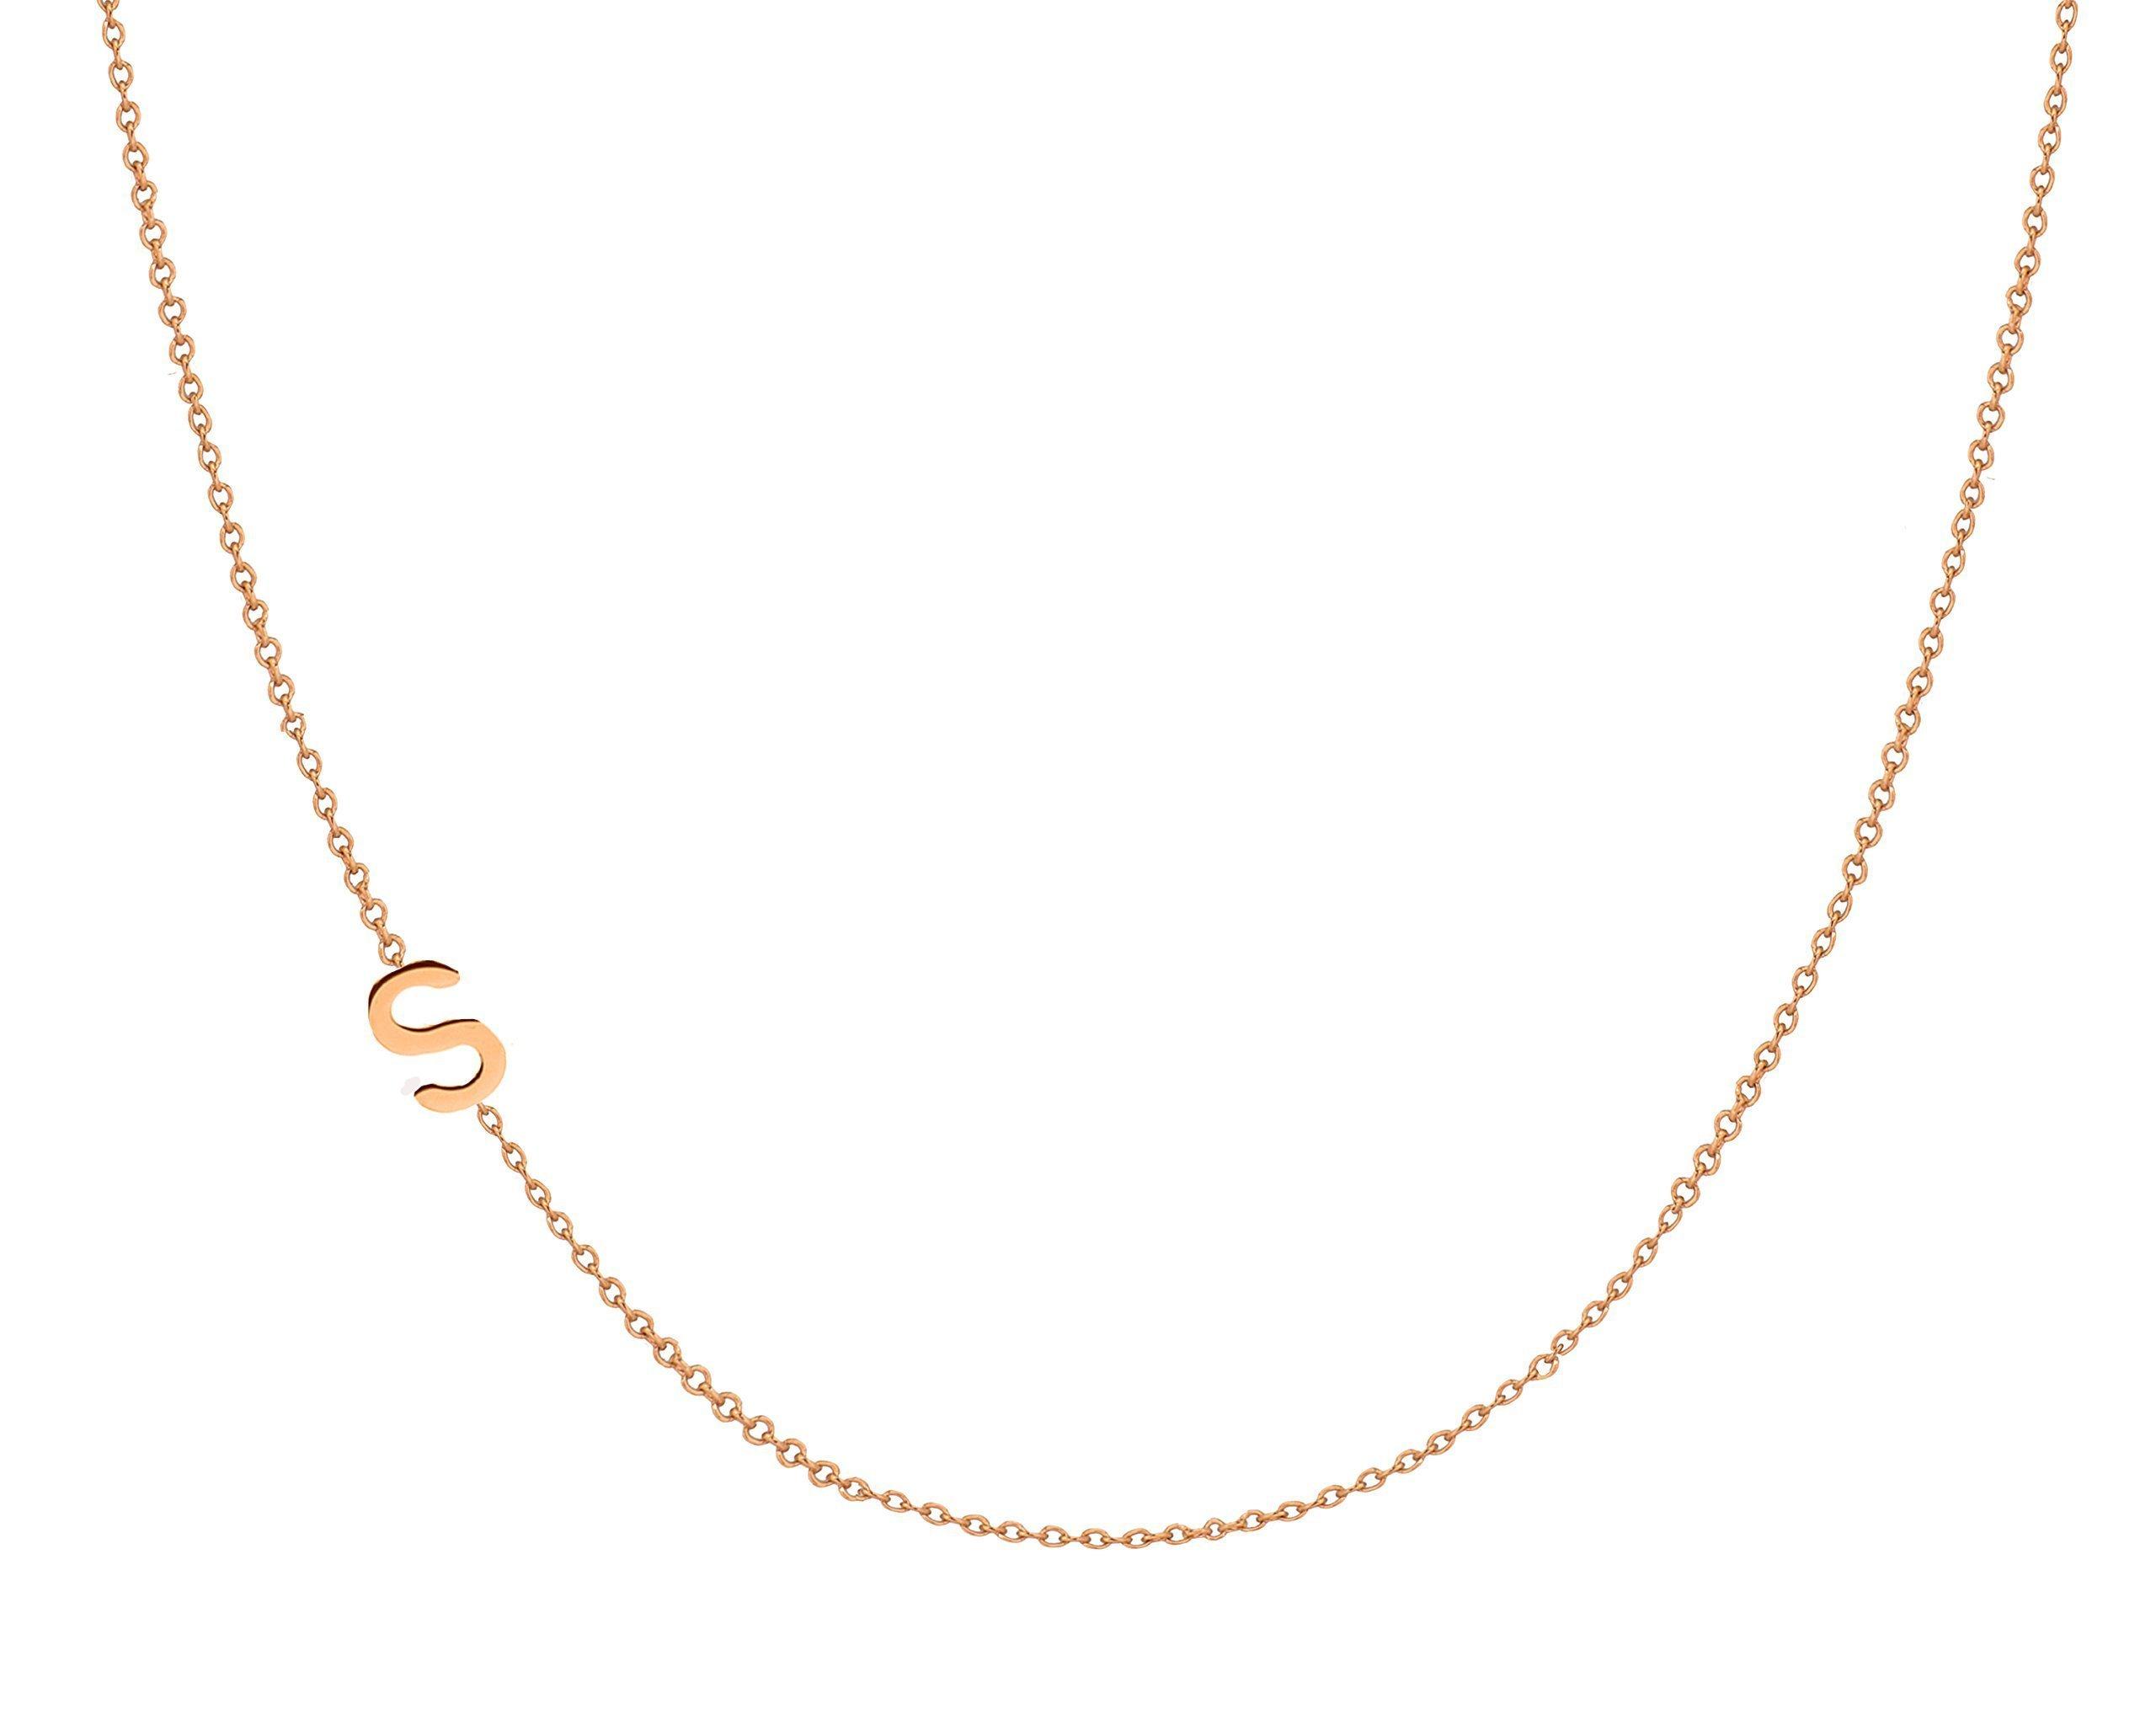 14k gold asymmetrical initial necklace by Zoe Lev Jewelry